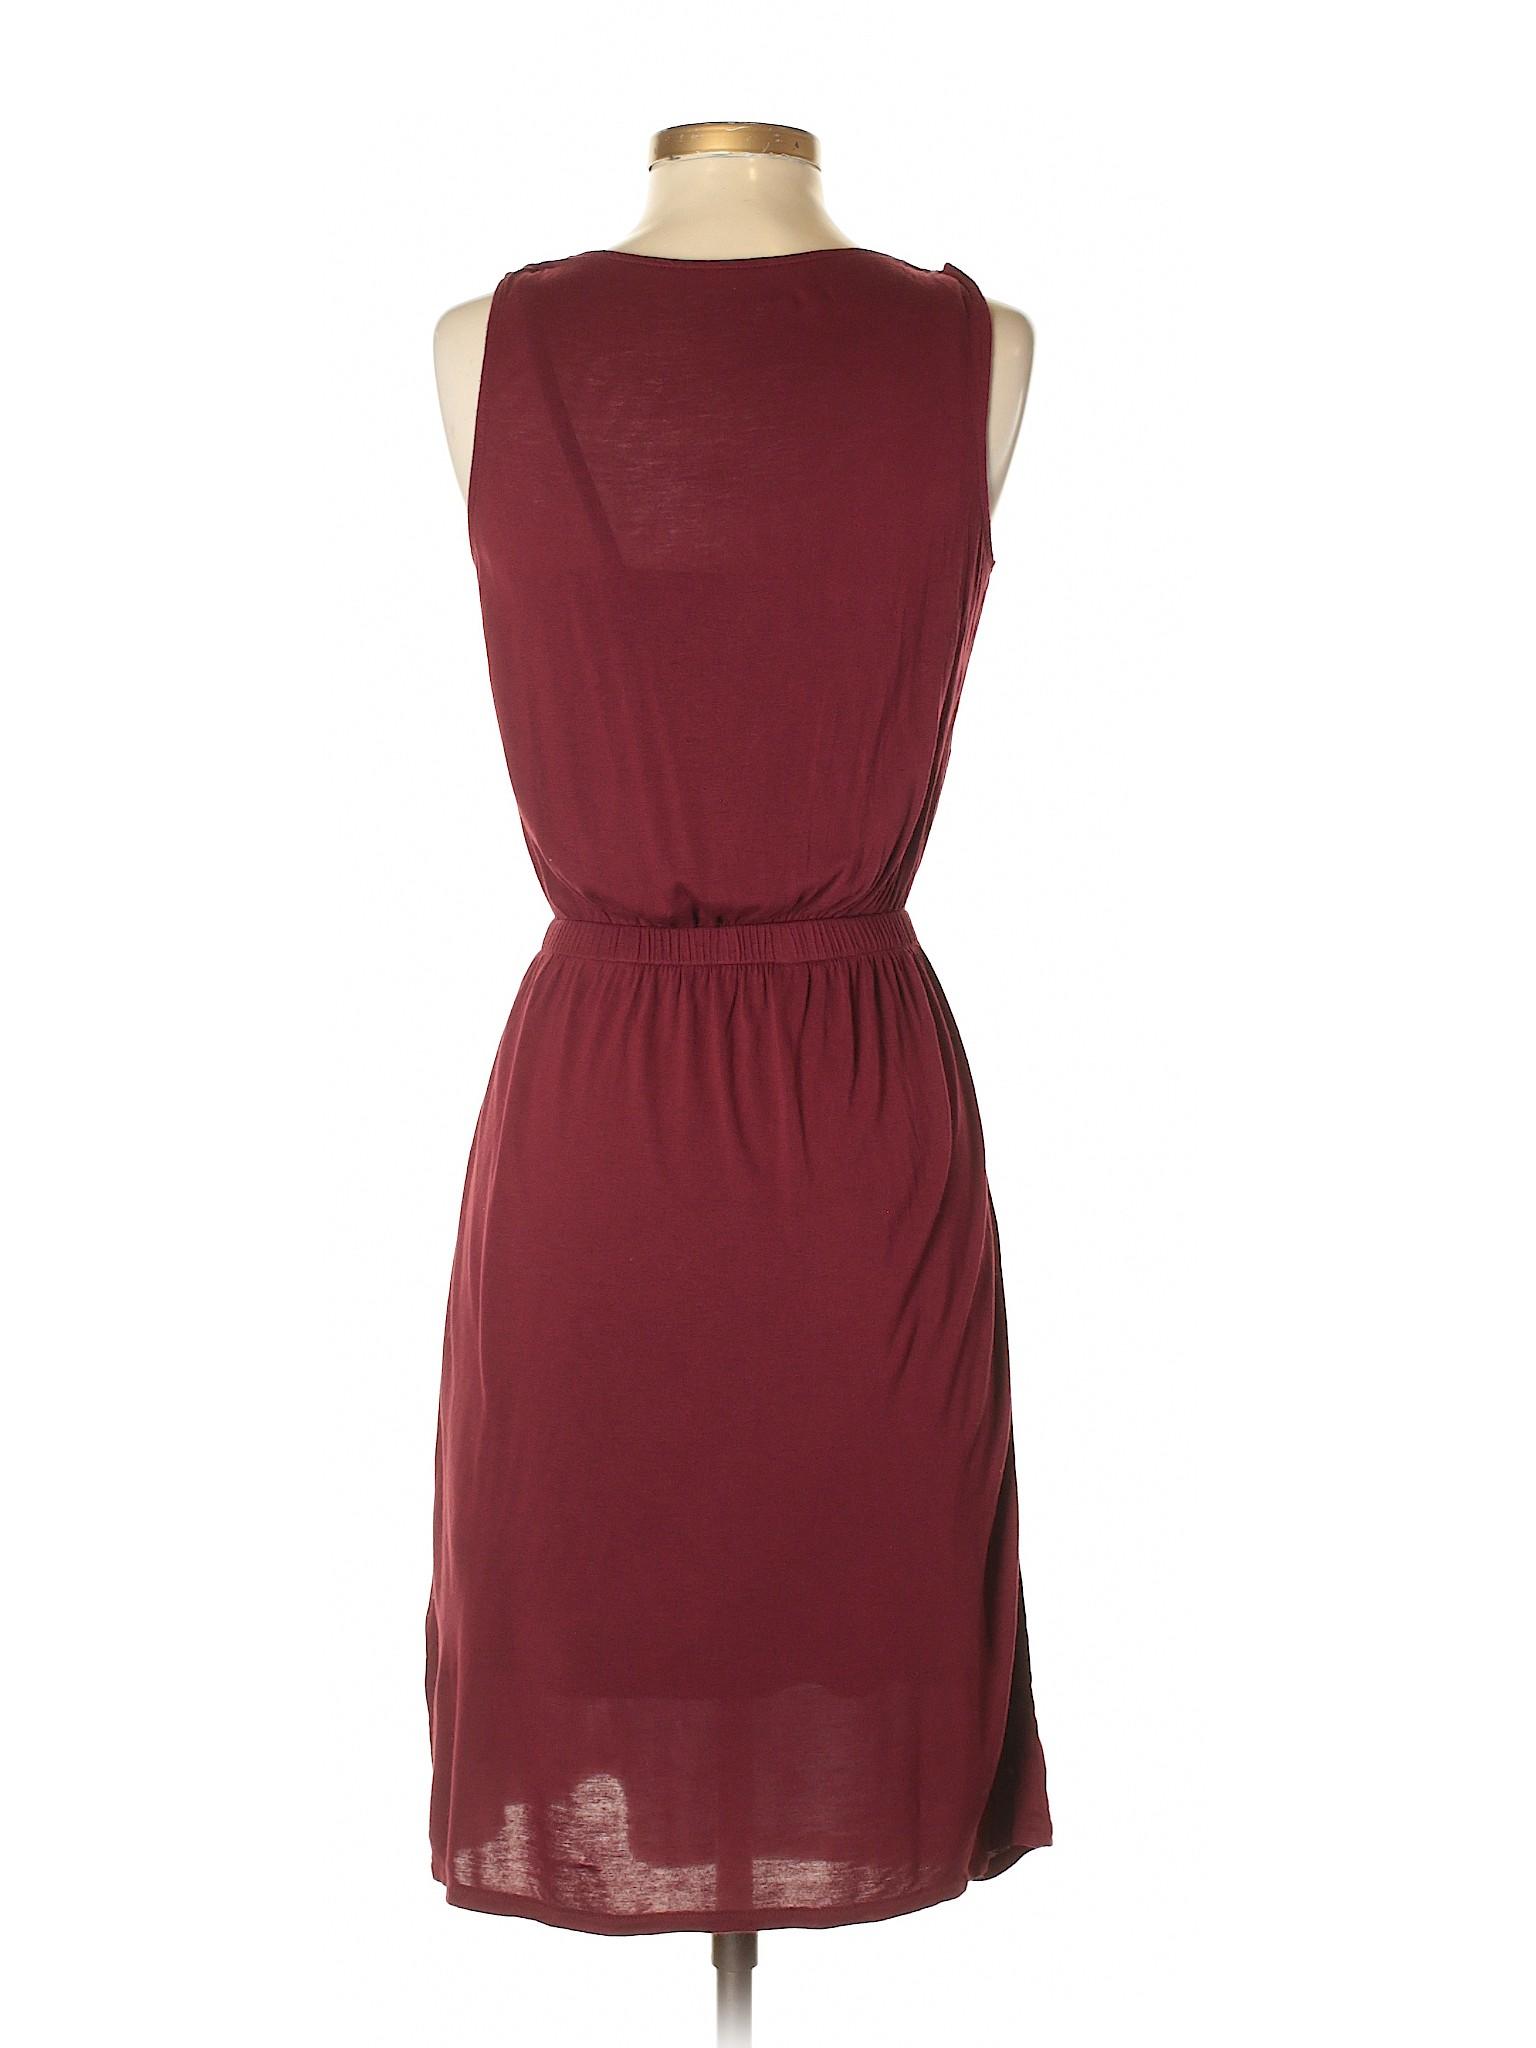 Merona Dress Casual Dress Casual Merona Selling Selling qqSBwI